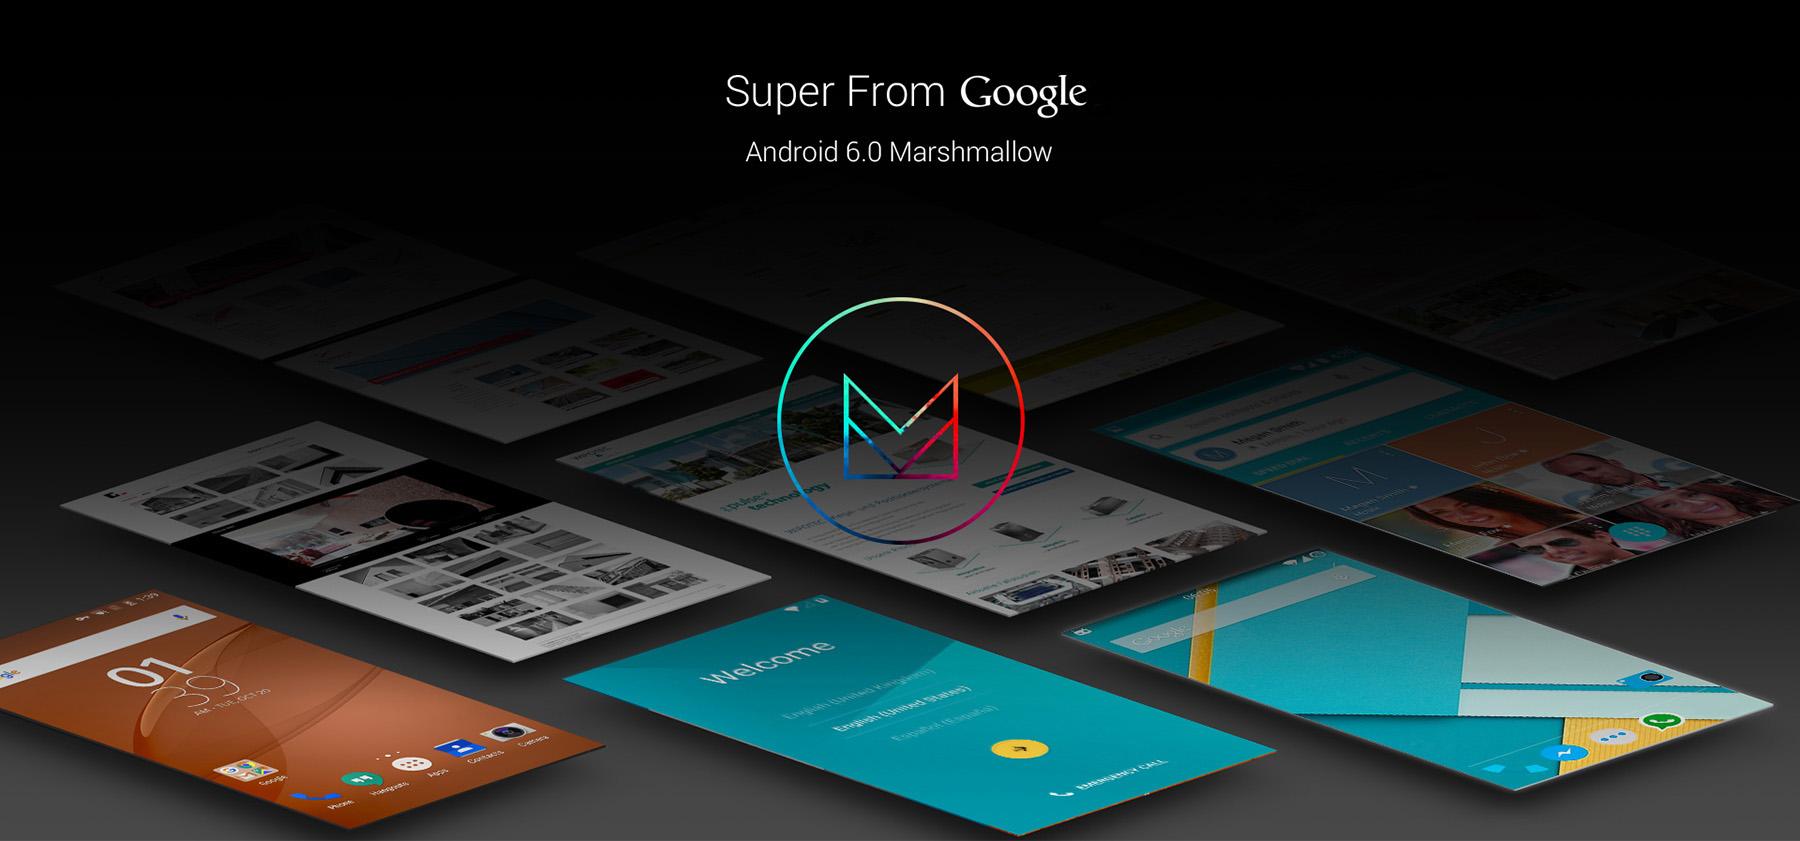 UMI Super , Android 6.0, Firmware Upgrade, rooten Root Anleitung, Kingroot, China Smartphone Test, Qualität günstig Smartphones, Phablet Test, Neuheiten 2016